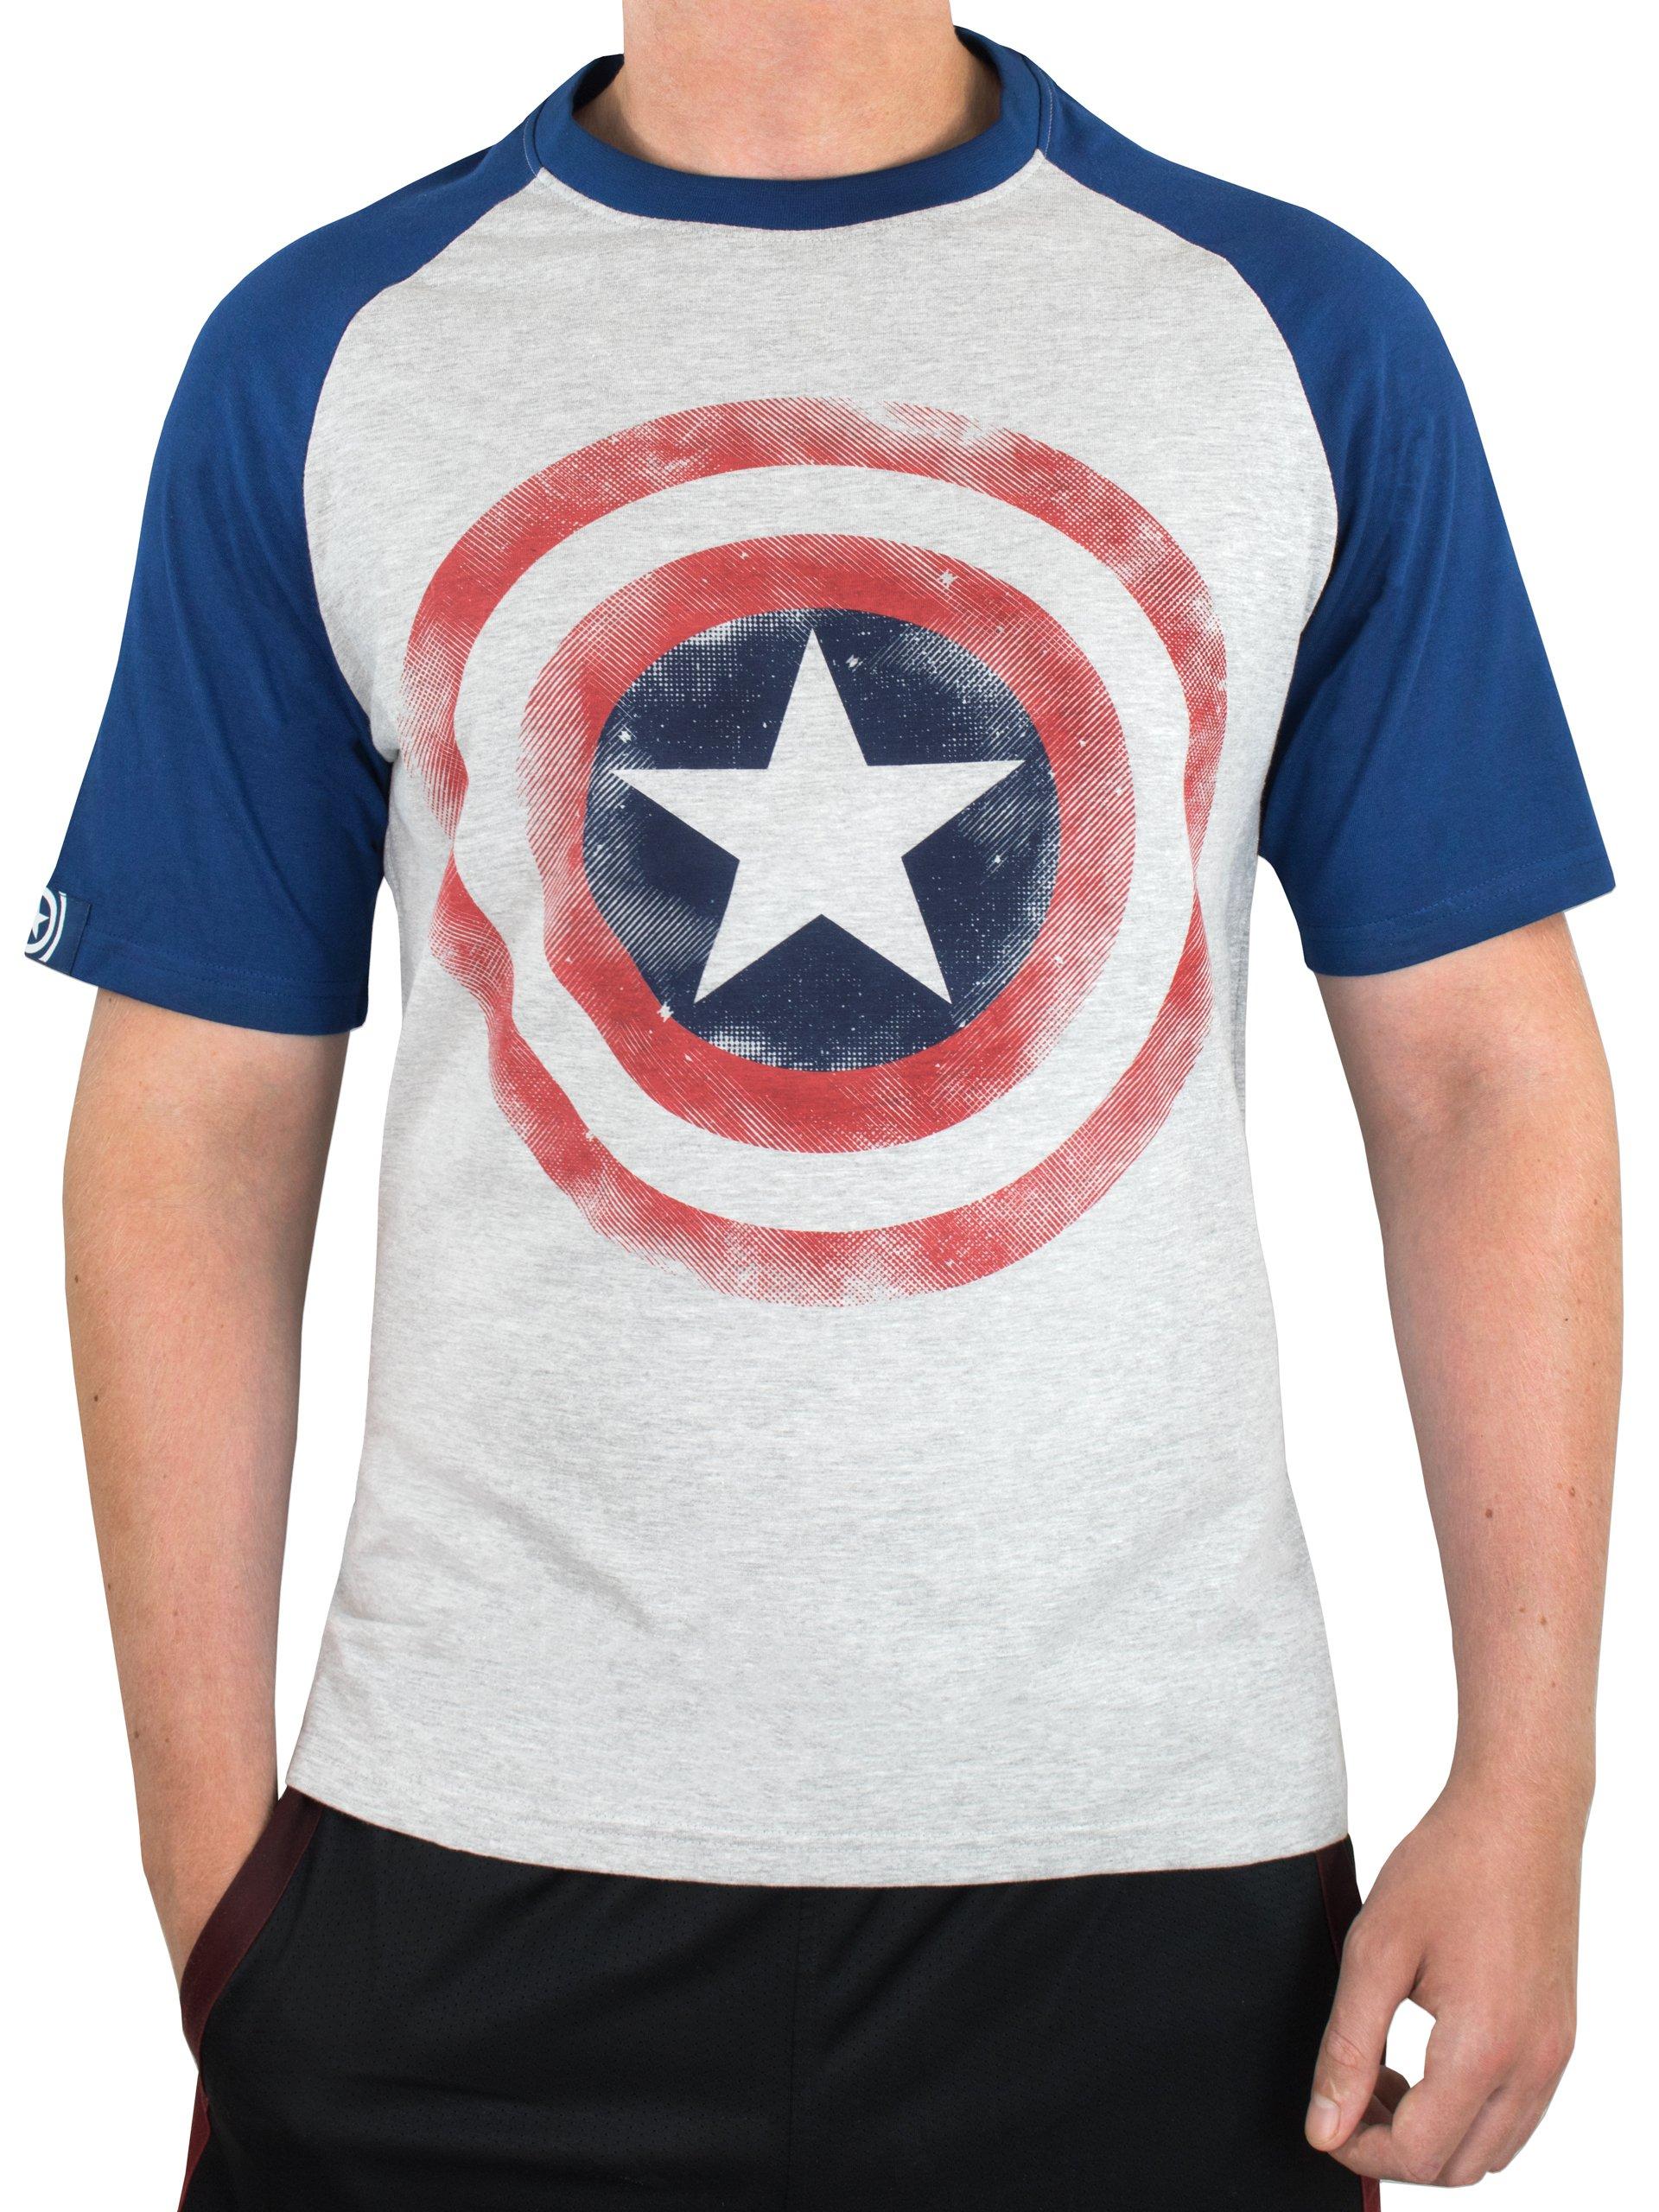 6 TEE NINERS Stark Industries T-Shirt